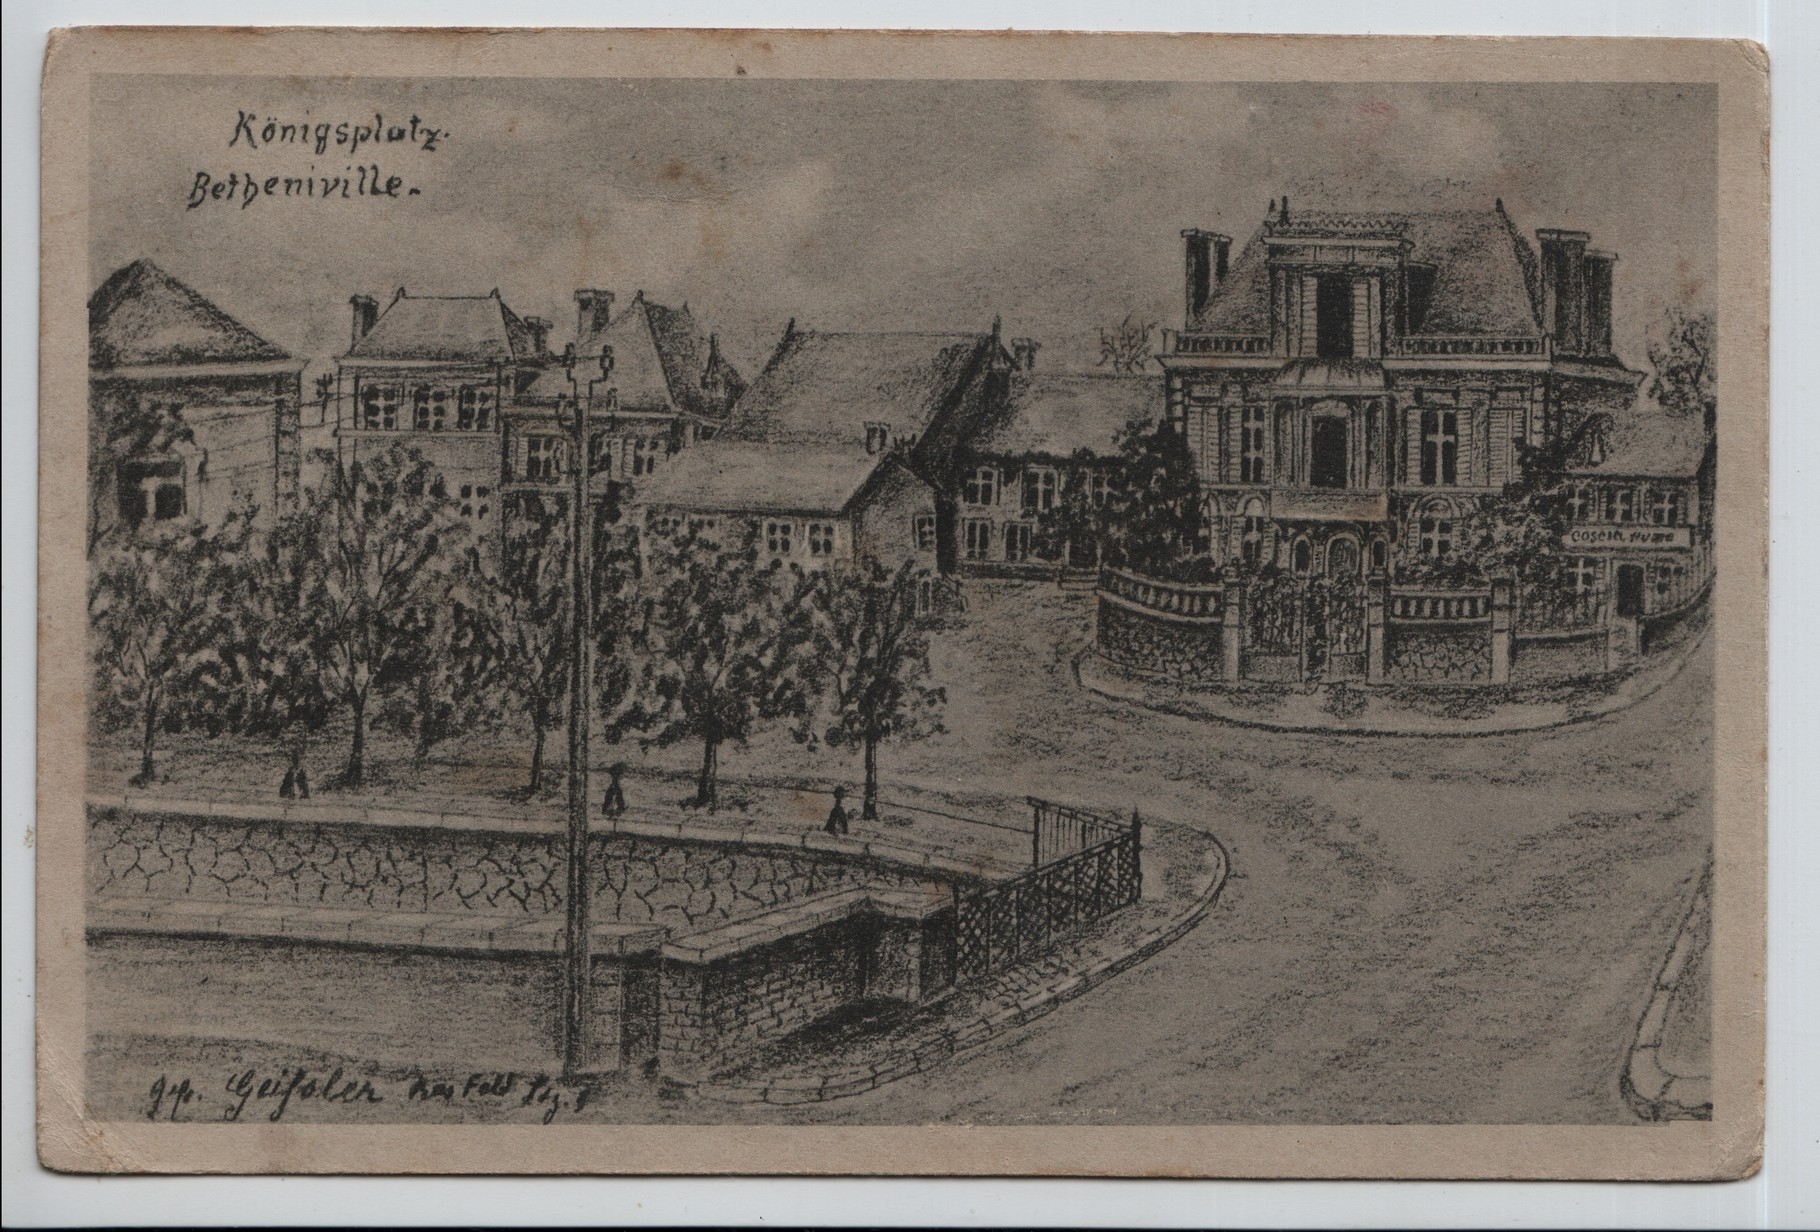 19. Konigsplatz Betheniville